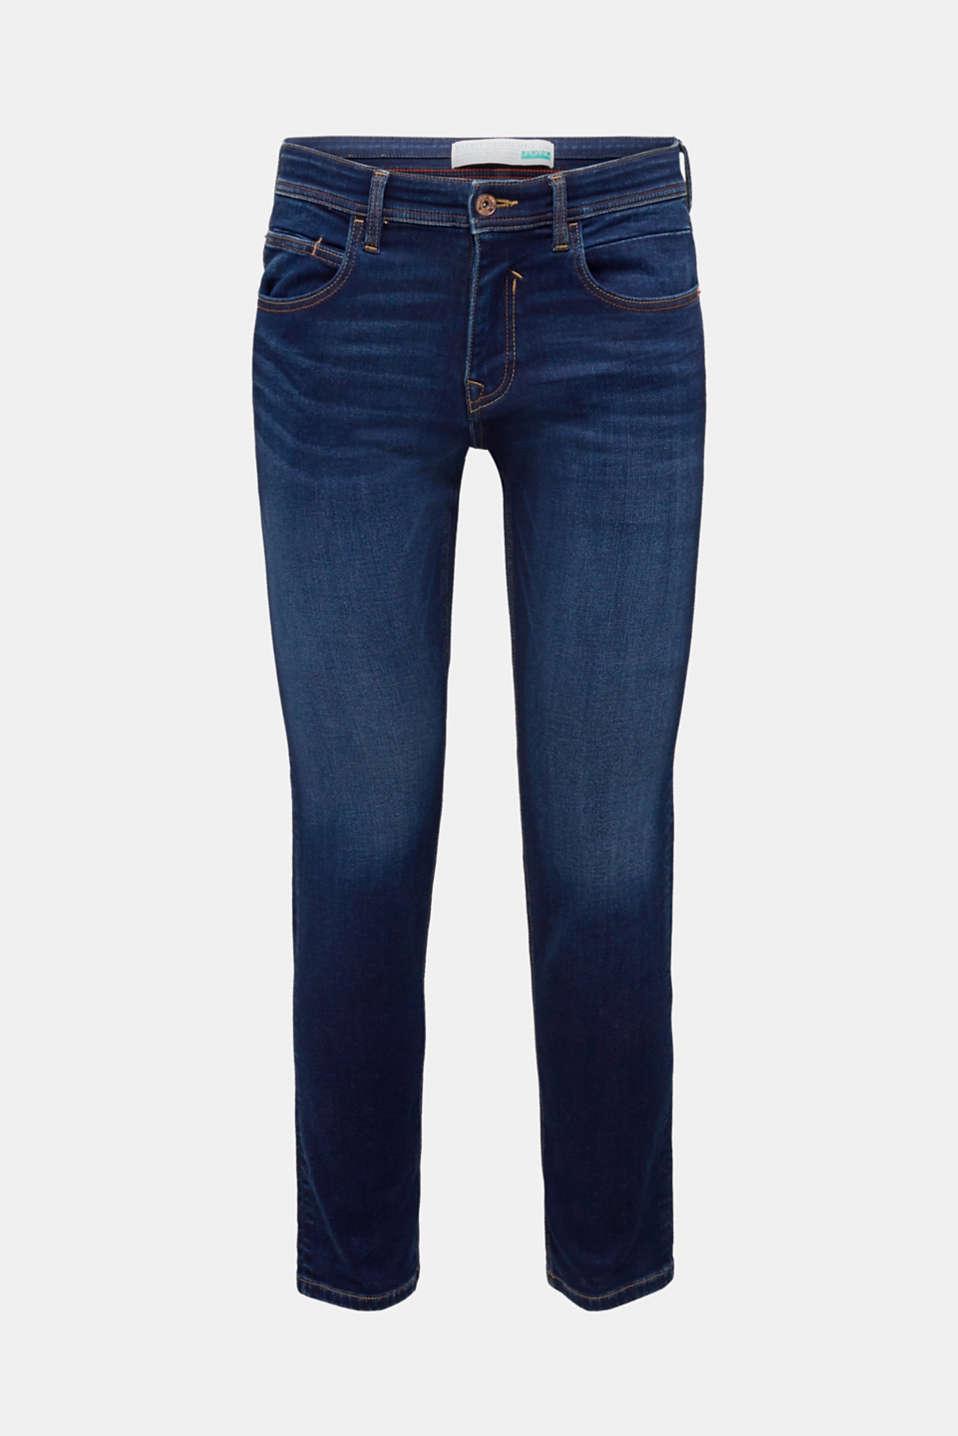 Pants denim, BLUE DARK WASH, detail image number 6